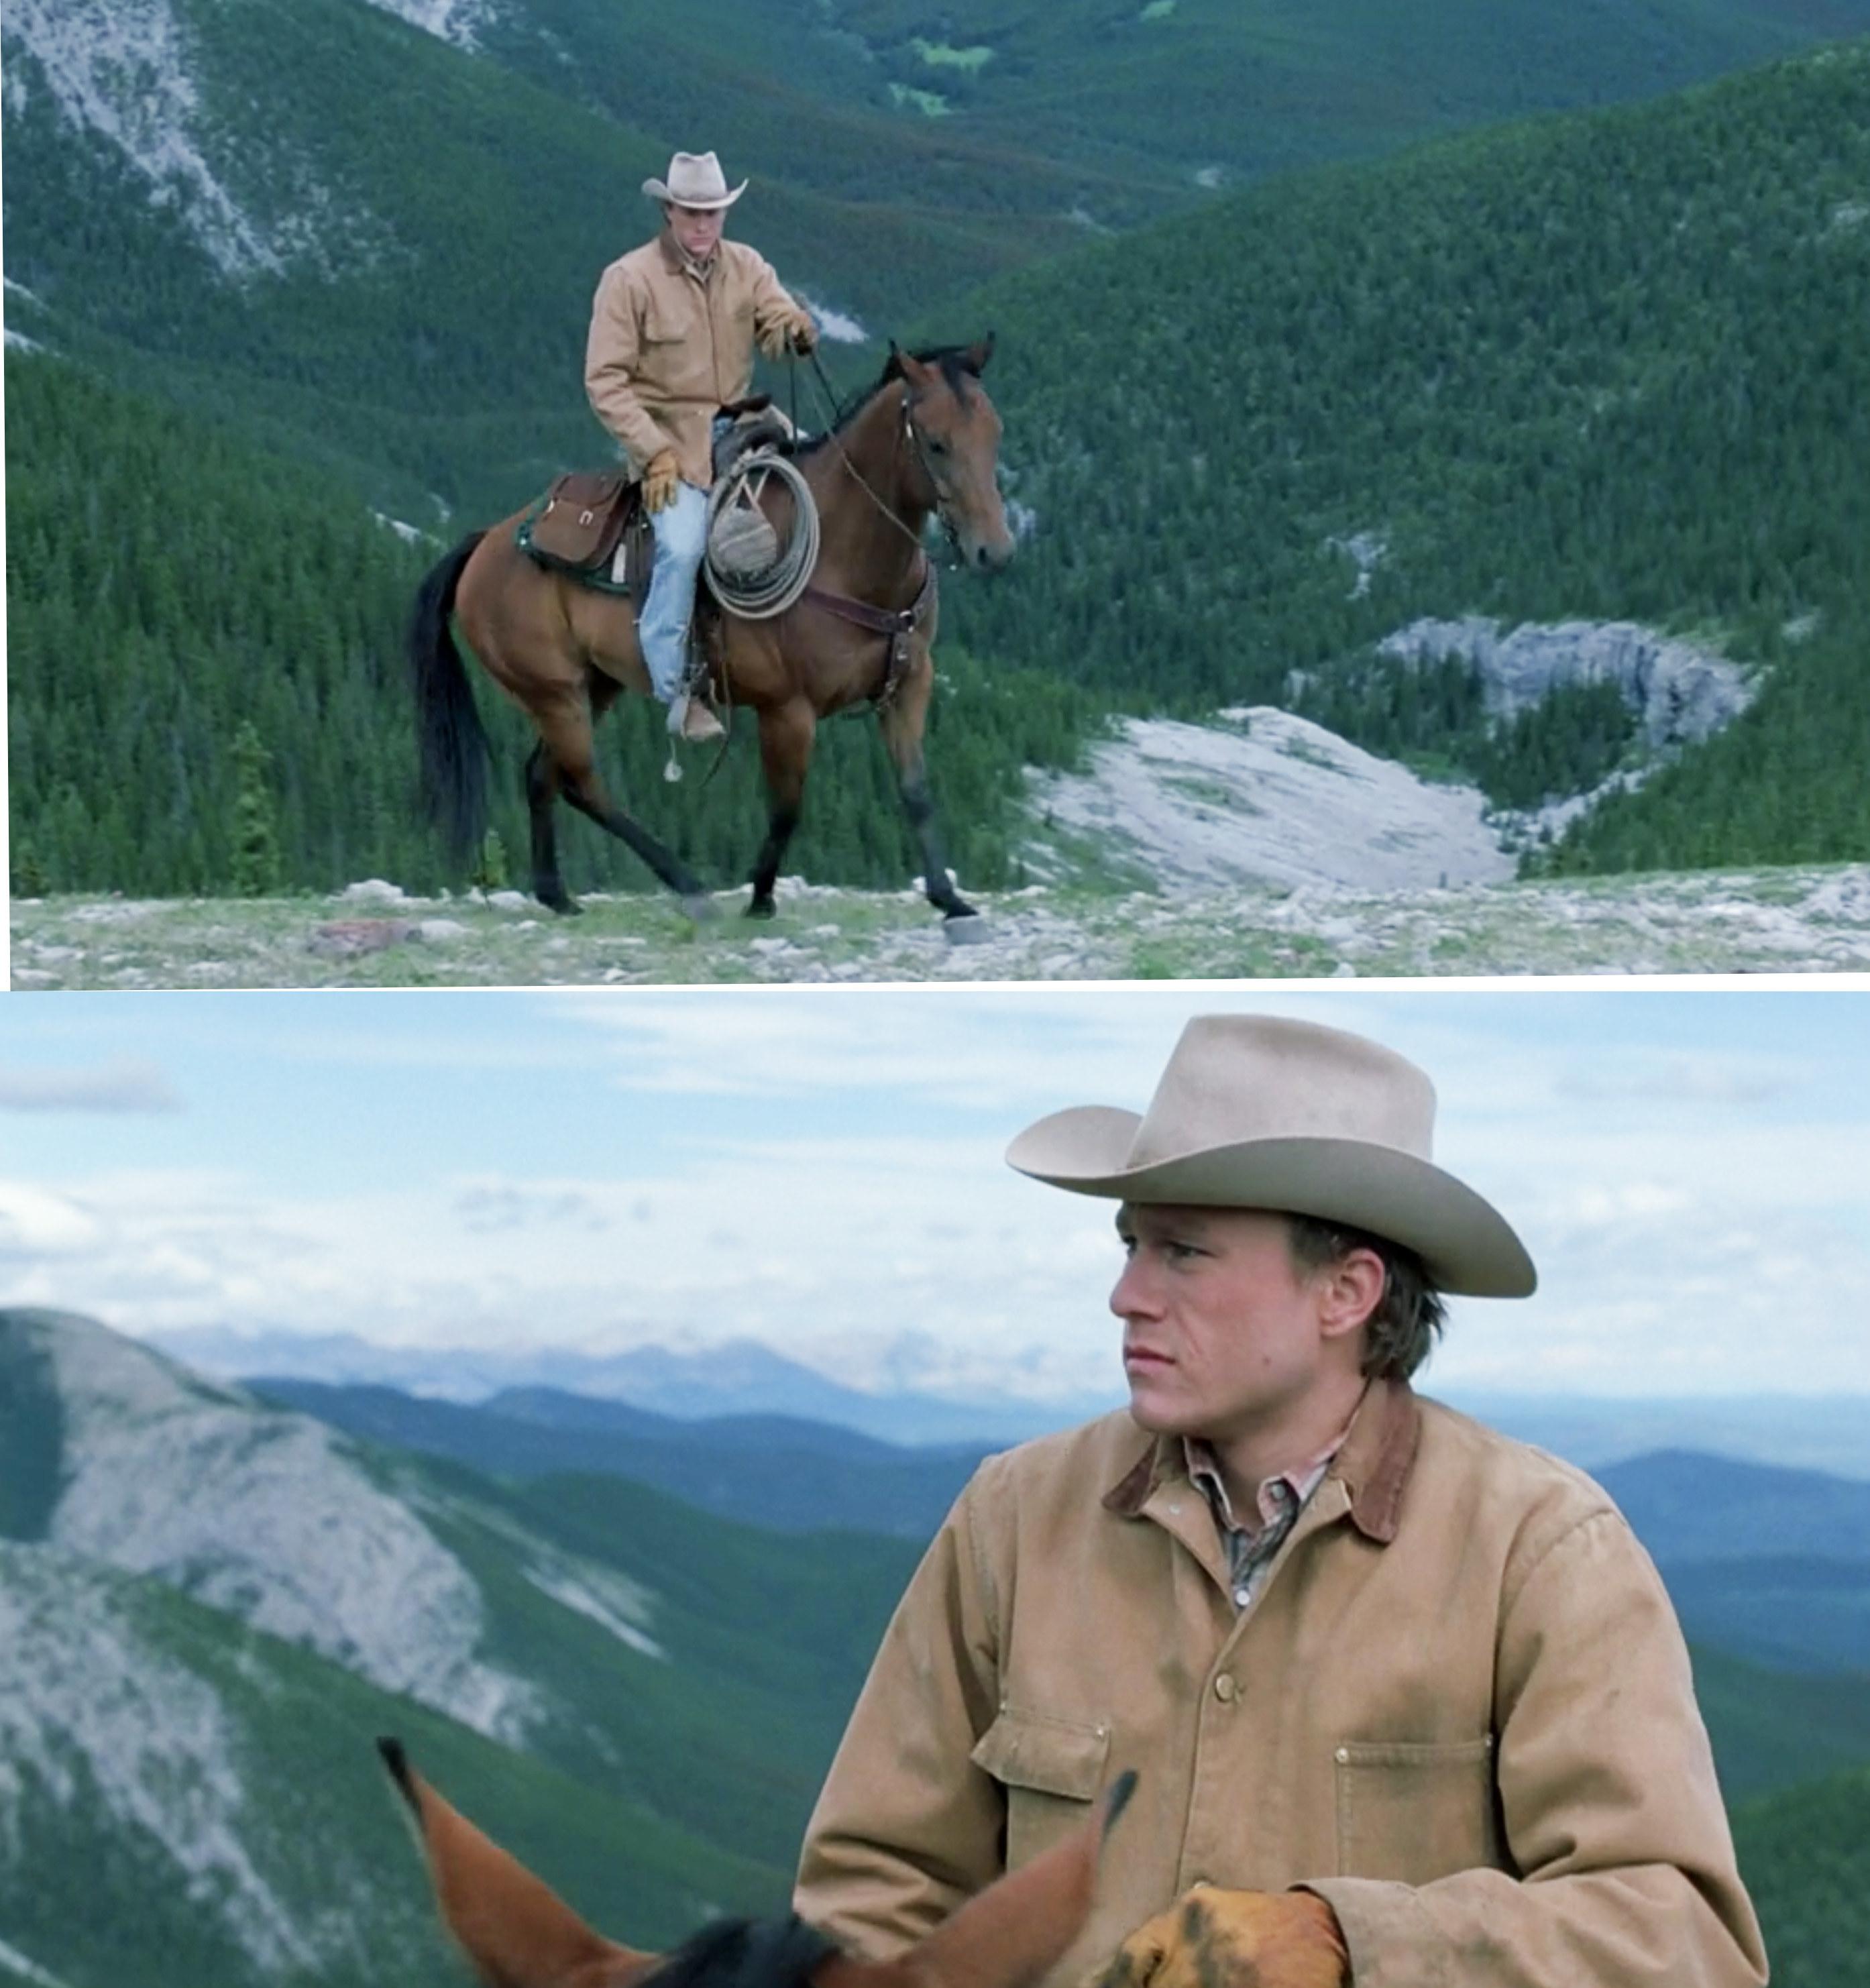 Ennis riding his horse